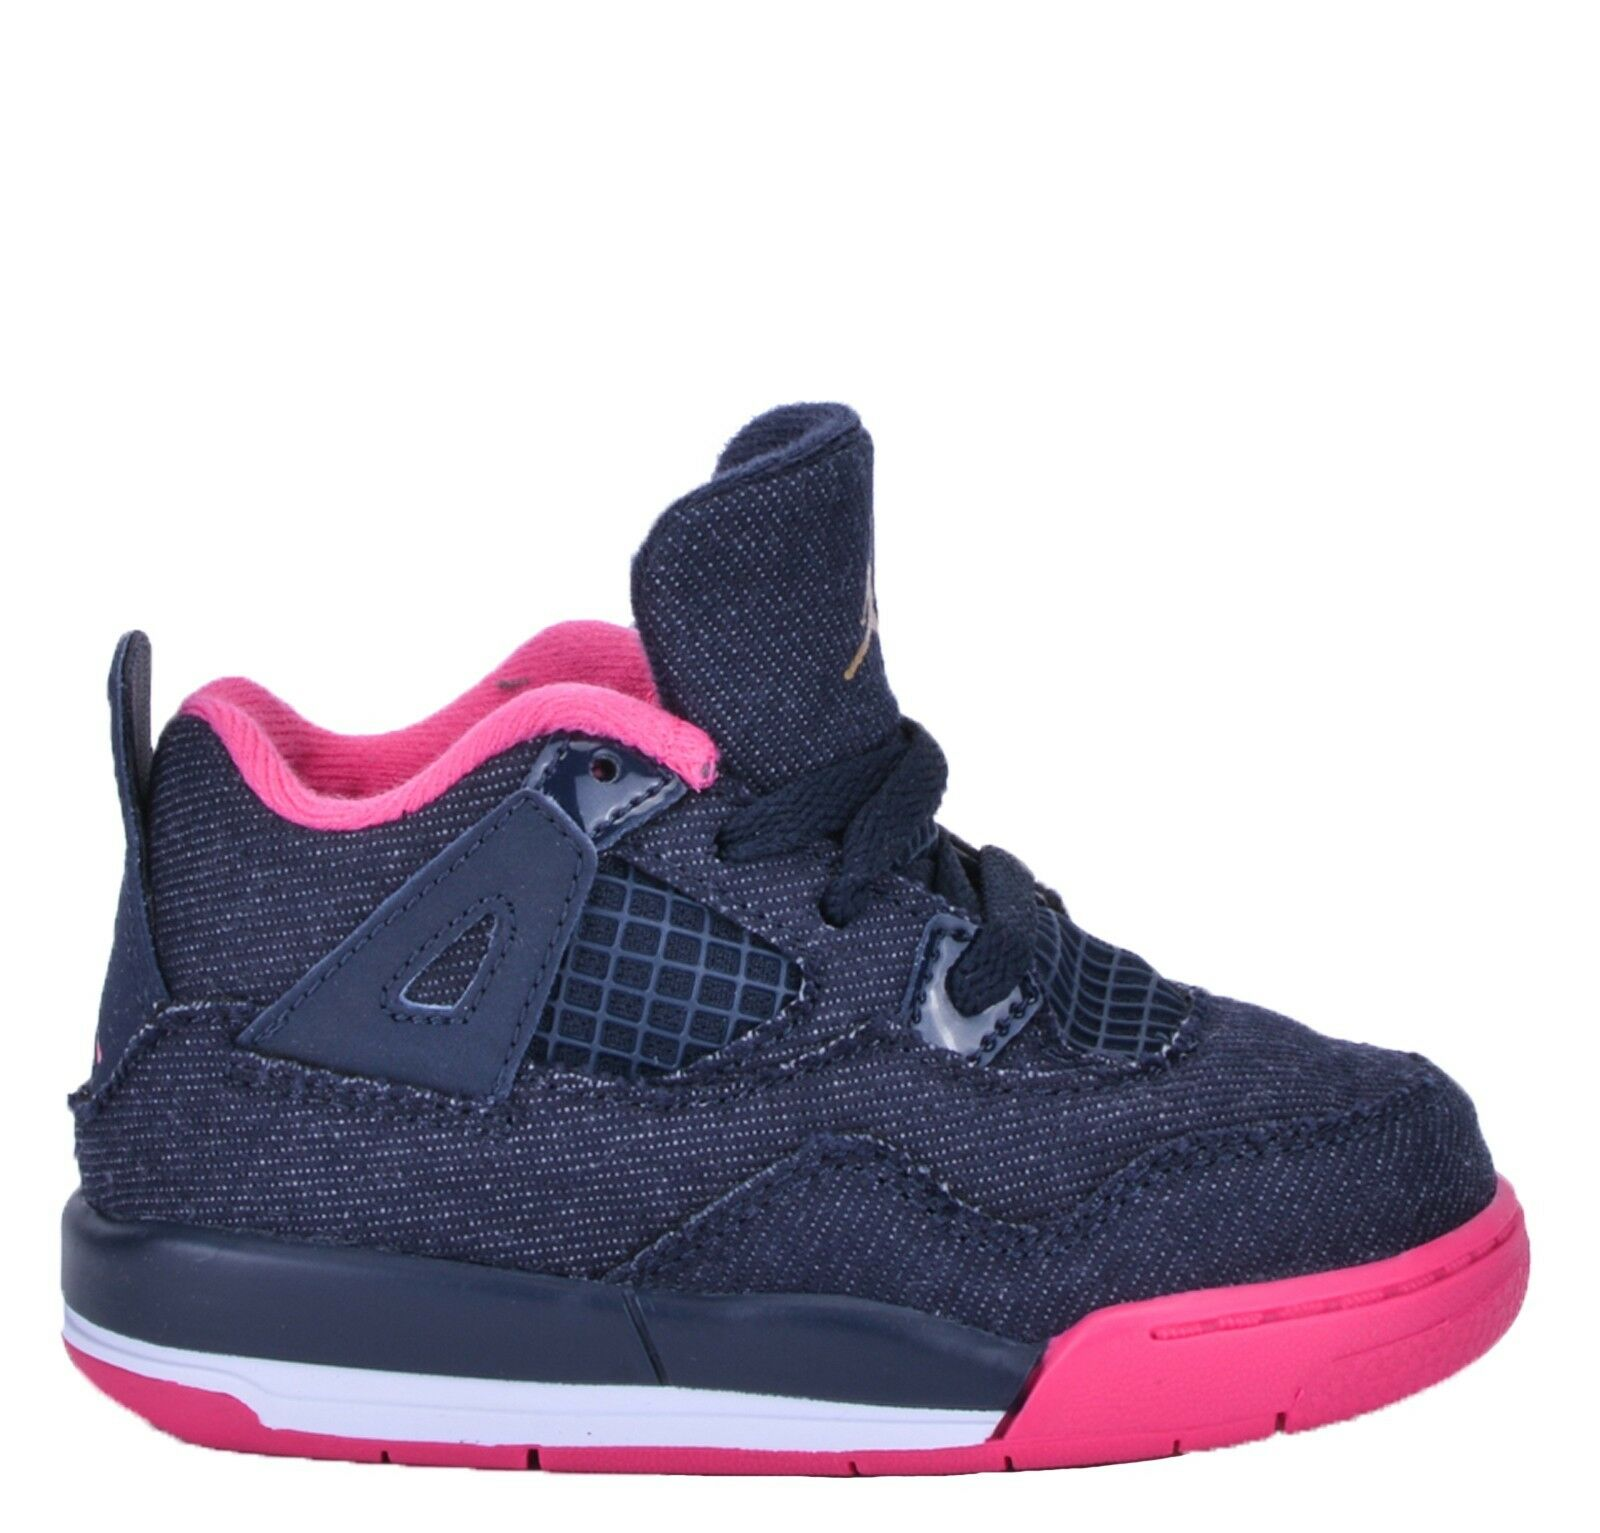 a8a782ca0a4136 ... shop size 6c toddler infants nike air jordan retro 4 denim pink  athletic 705345 fa4e2 bb634 ...